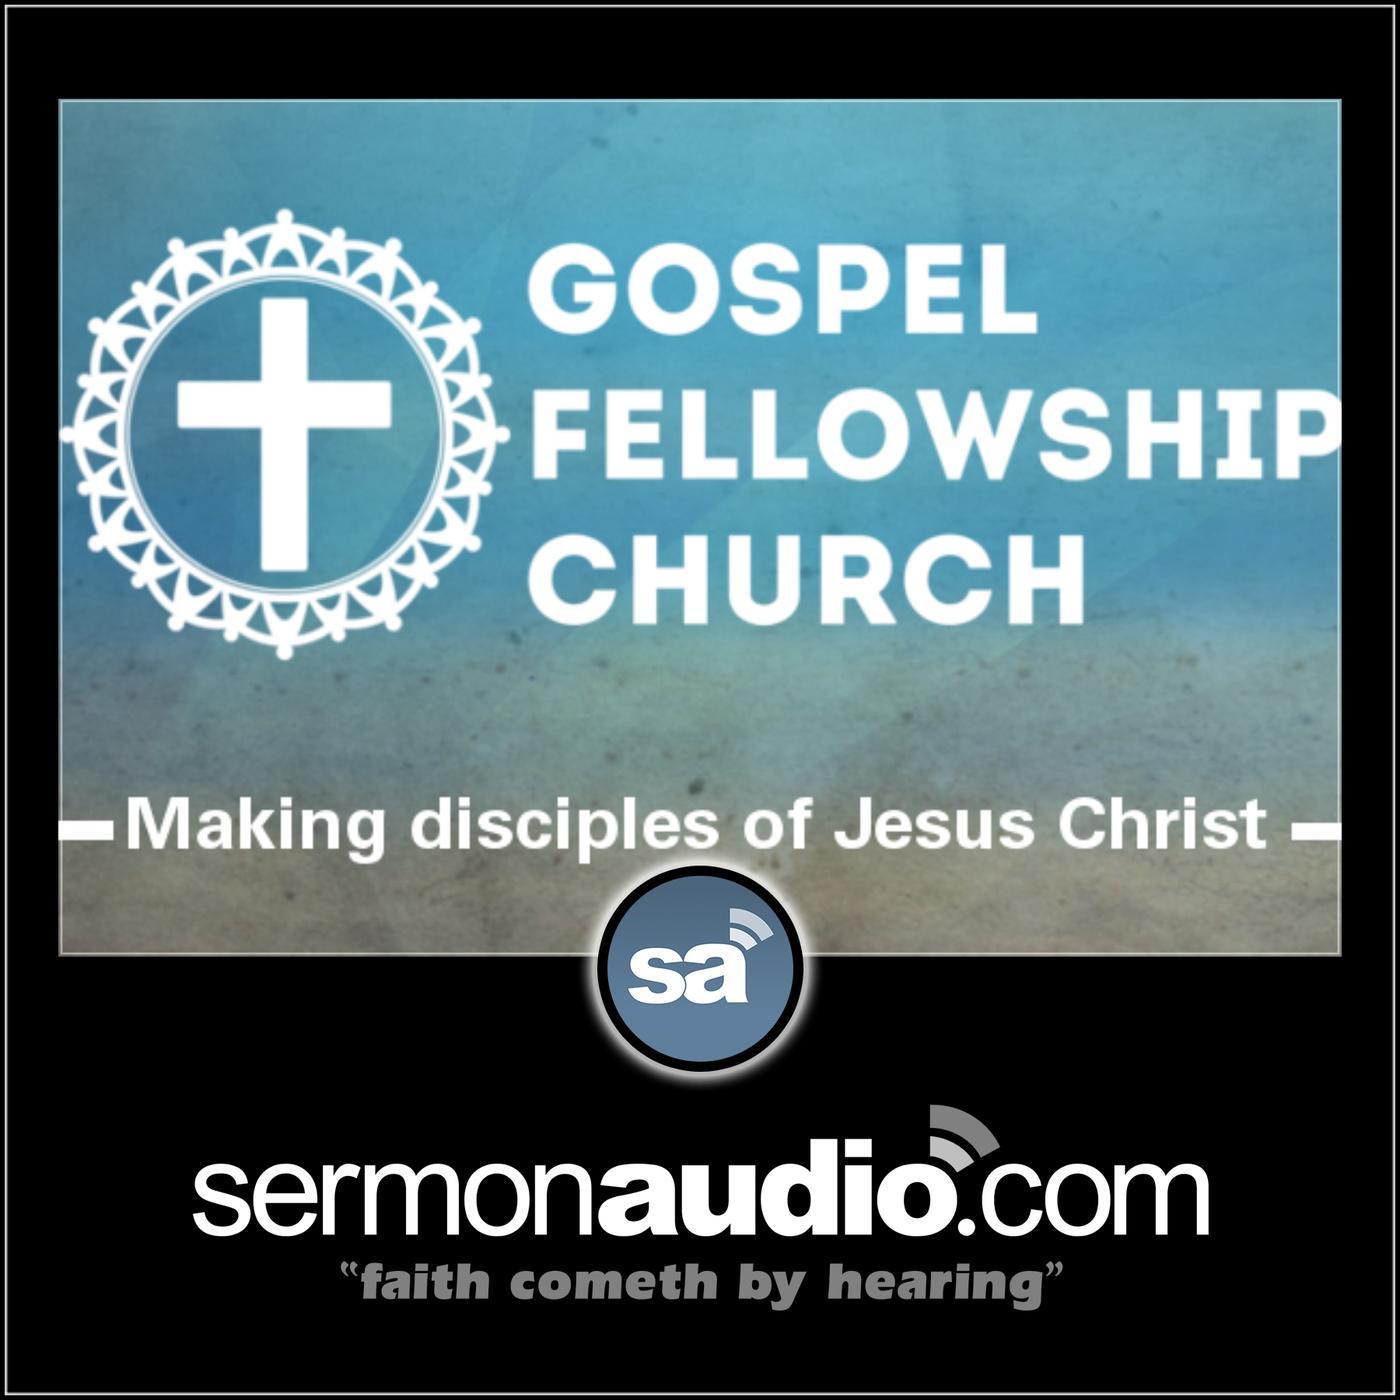 Gospel Fellowship Church